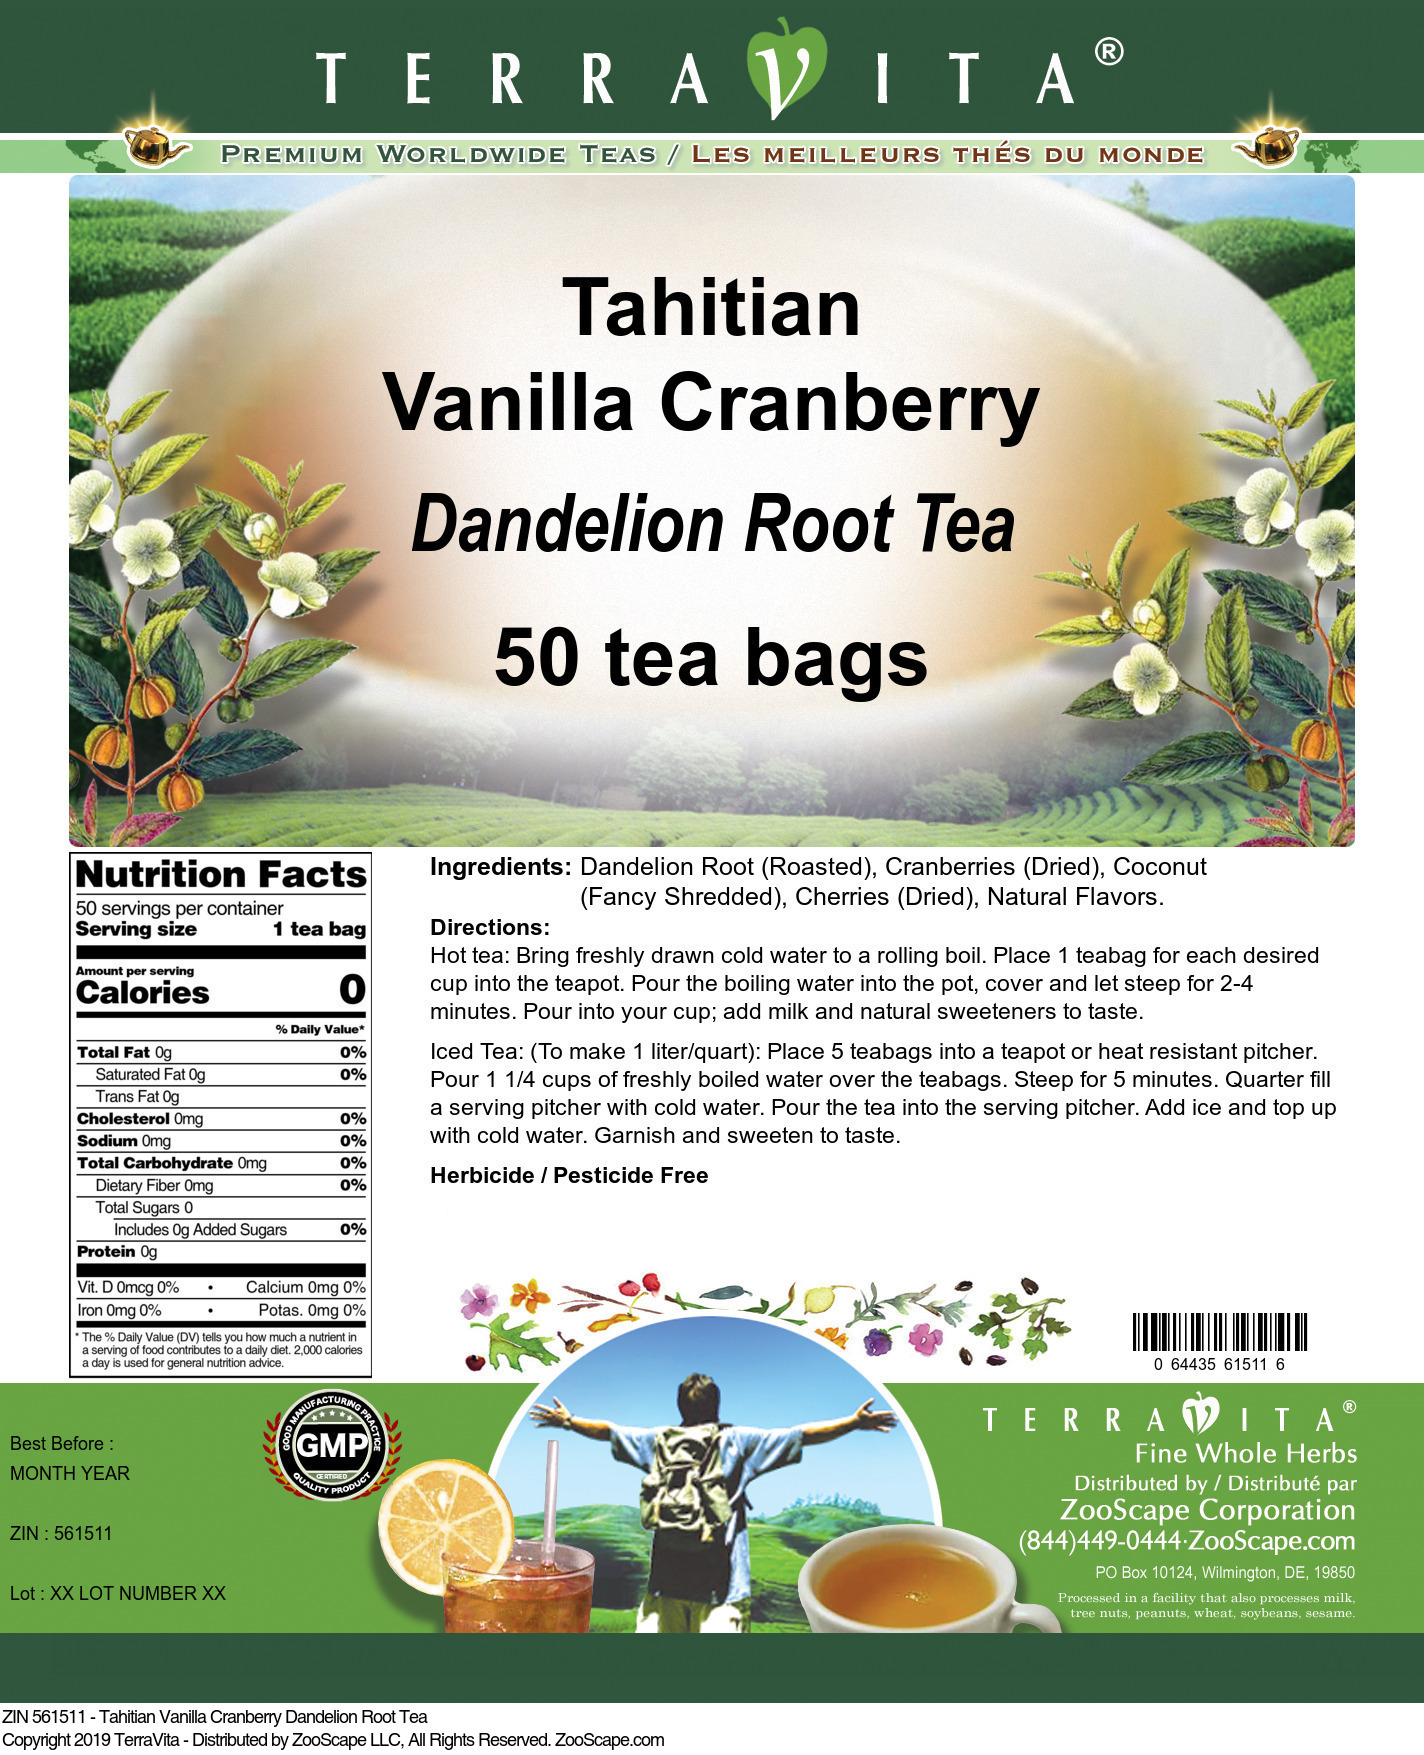 Tahitian Vanilla Cranberry Dandelion Root